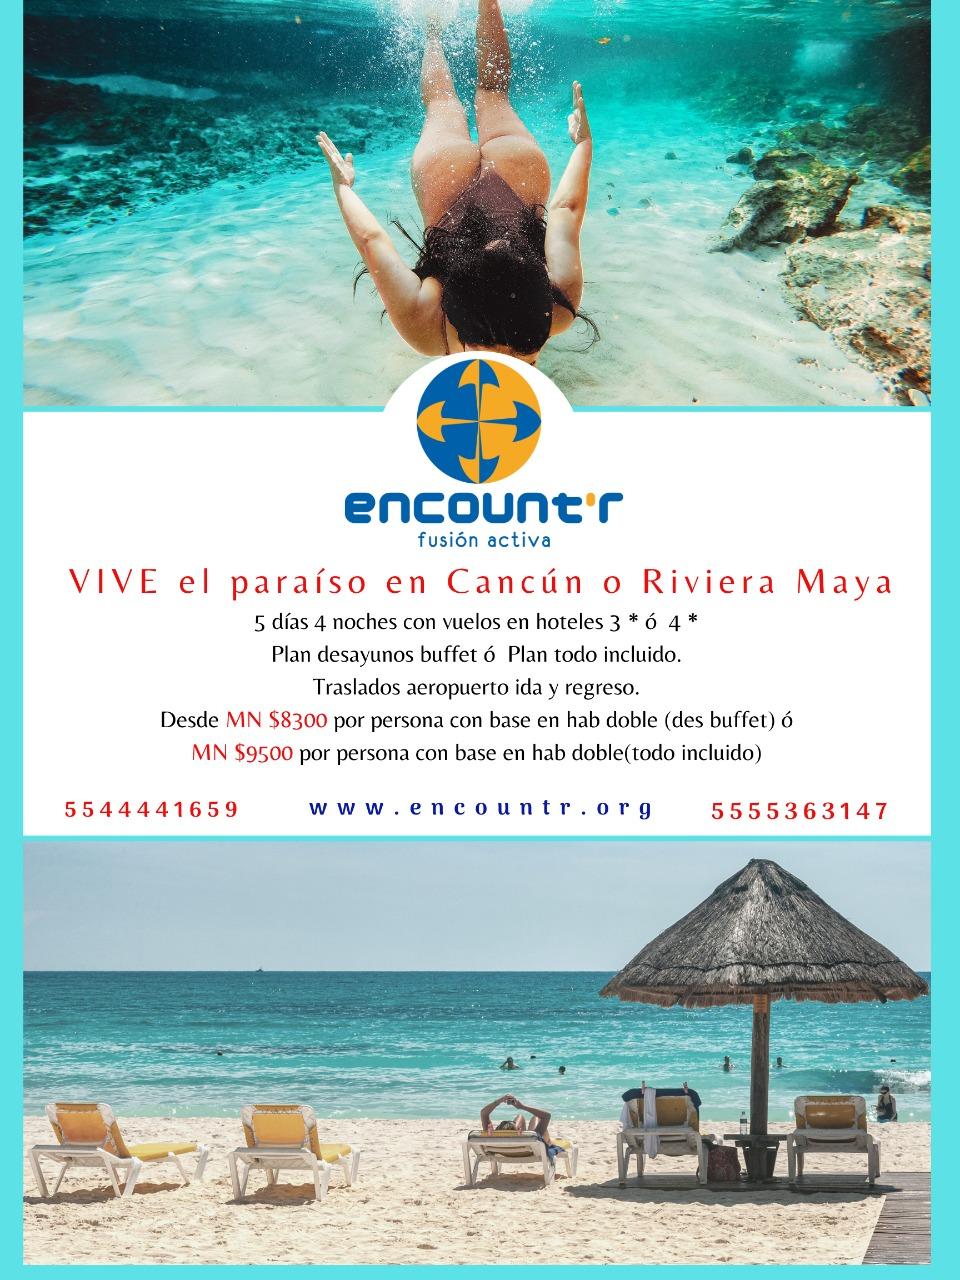 Viaje a Cancún o Riviera Maya